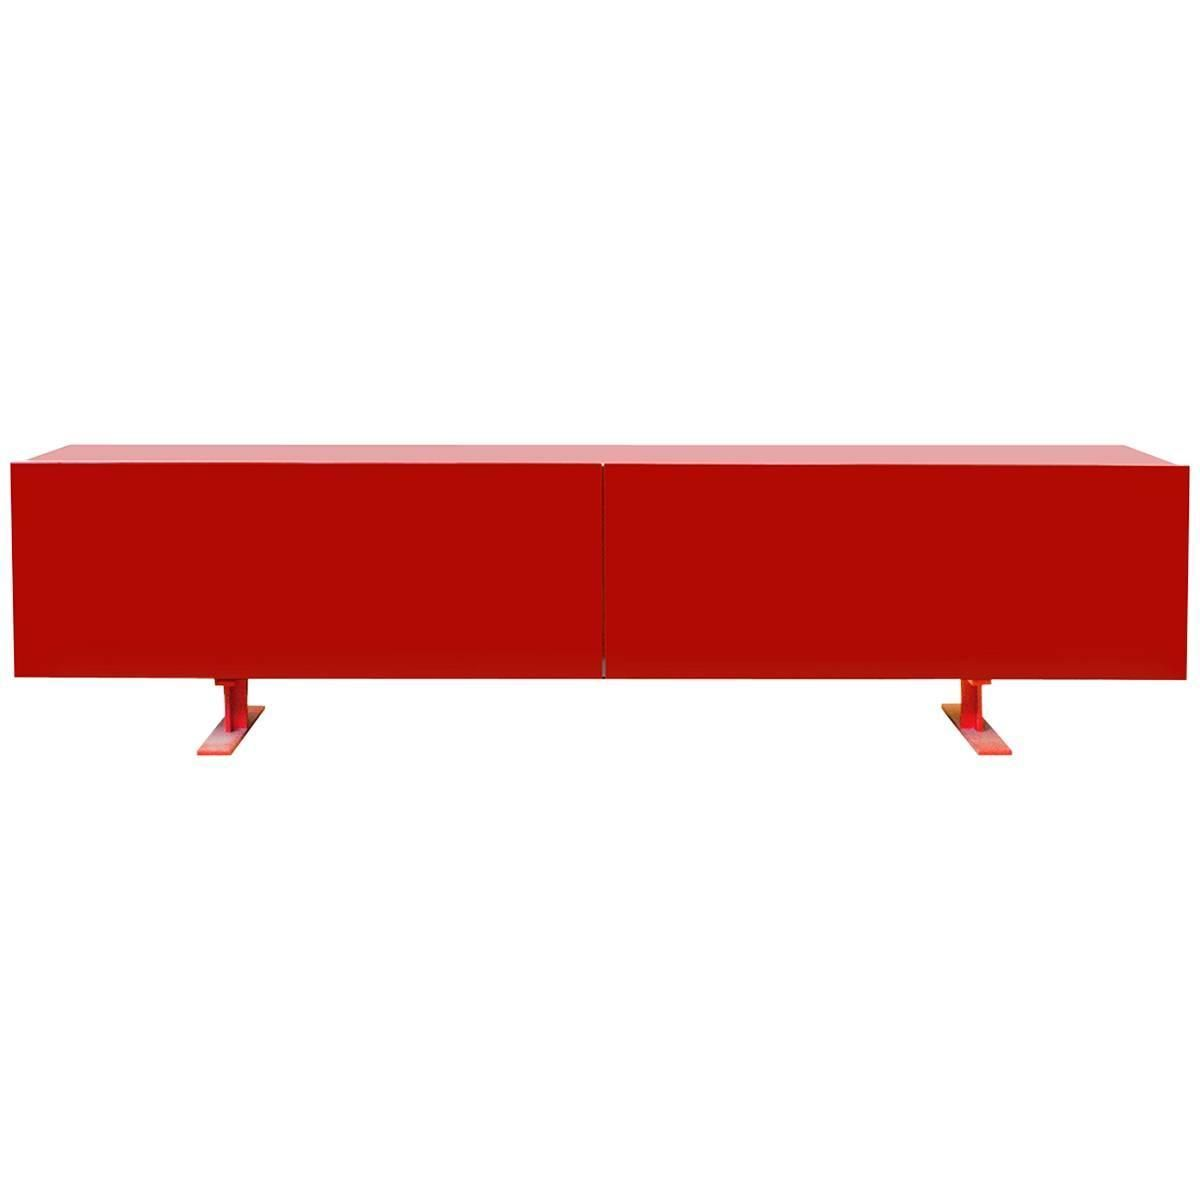 Cappellini Luxor Cabinet By Giulio Cappellini Red Italy